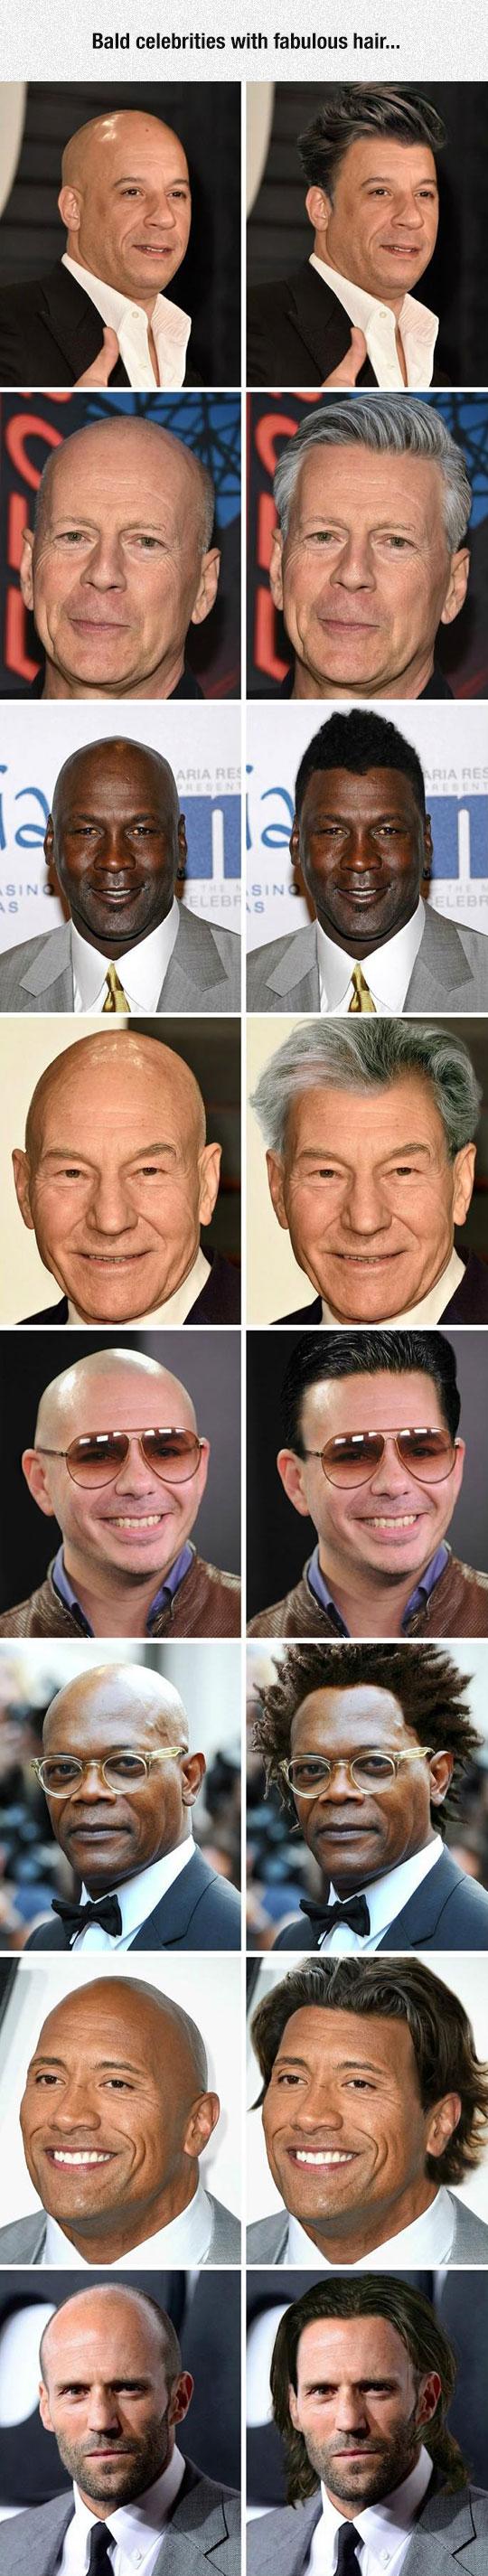 funny-bald-celebrities-hair-photoshopped